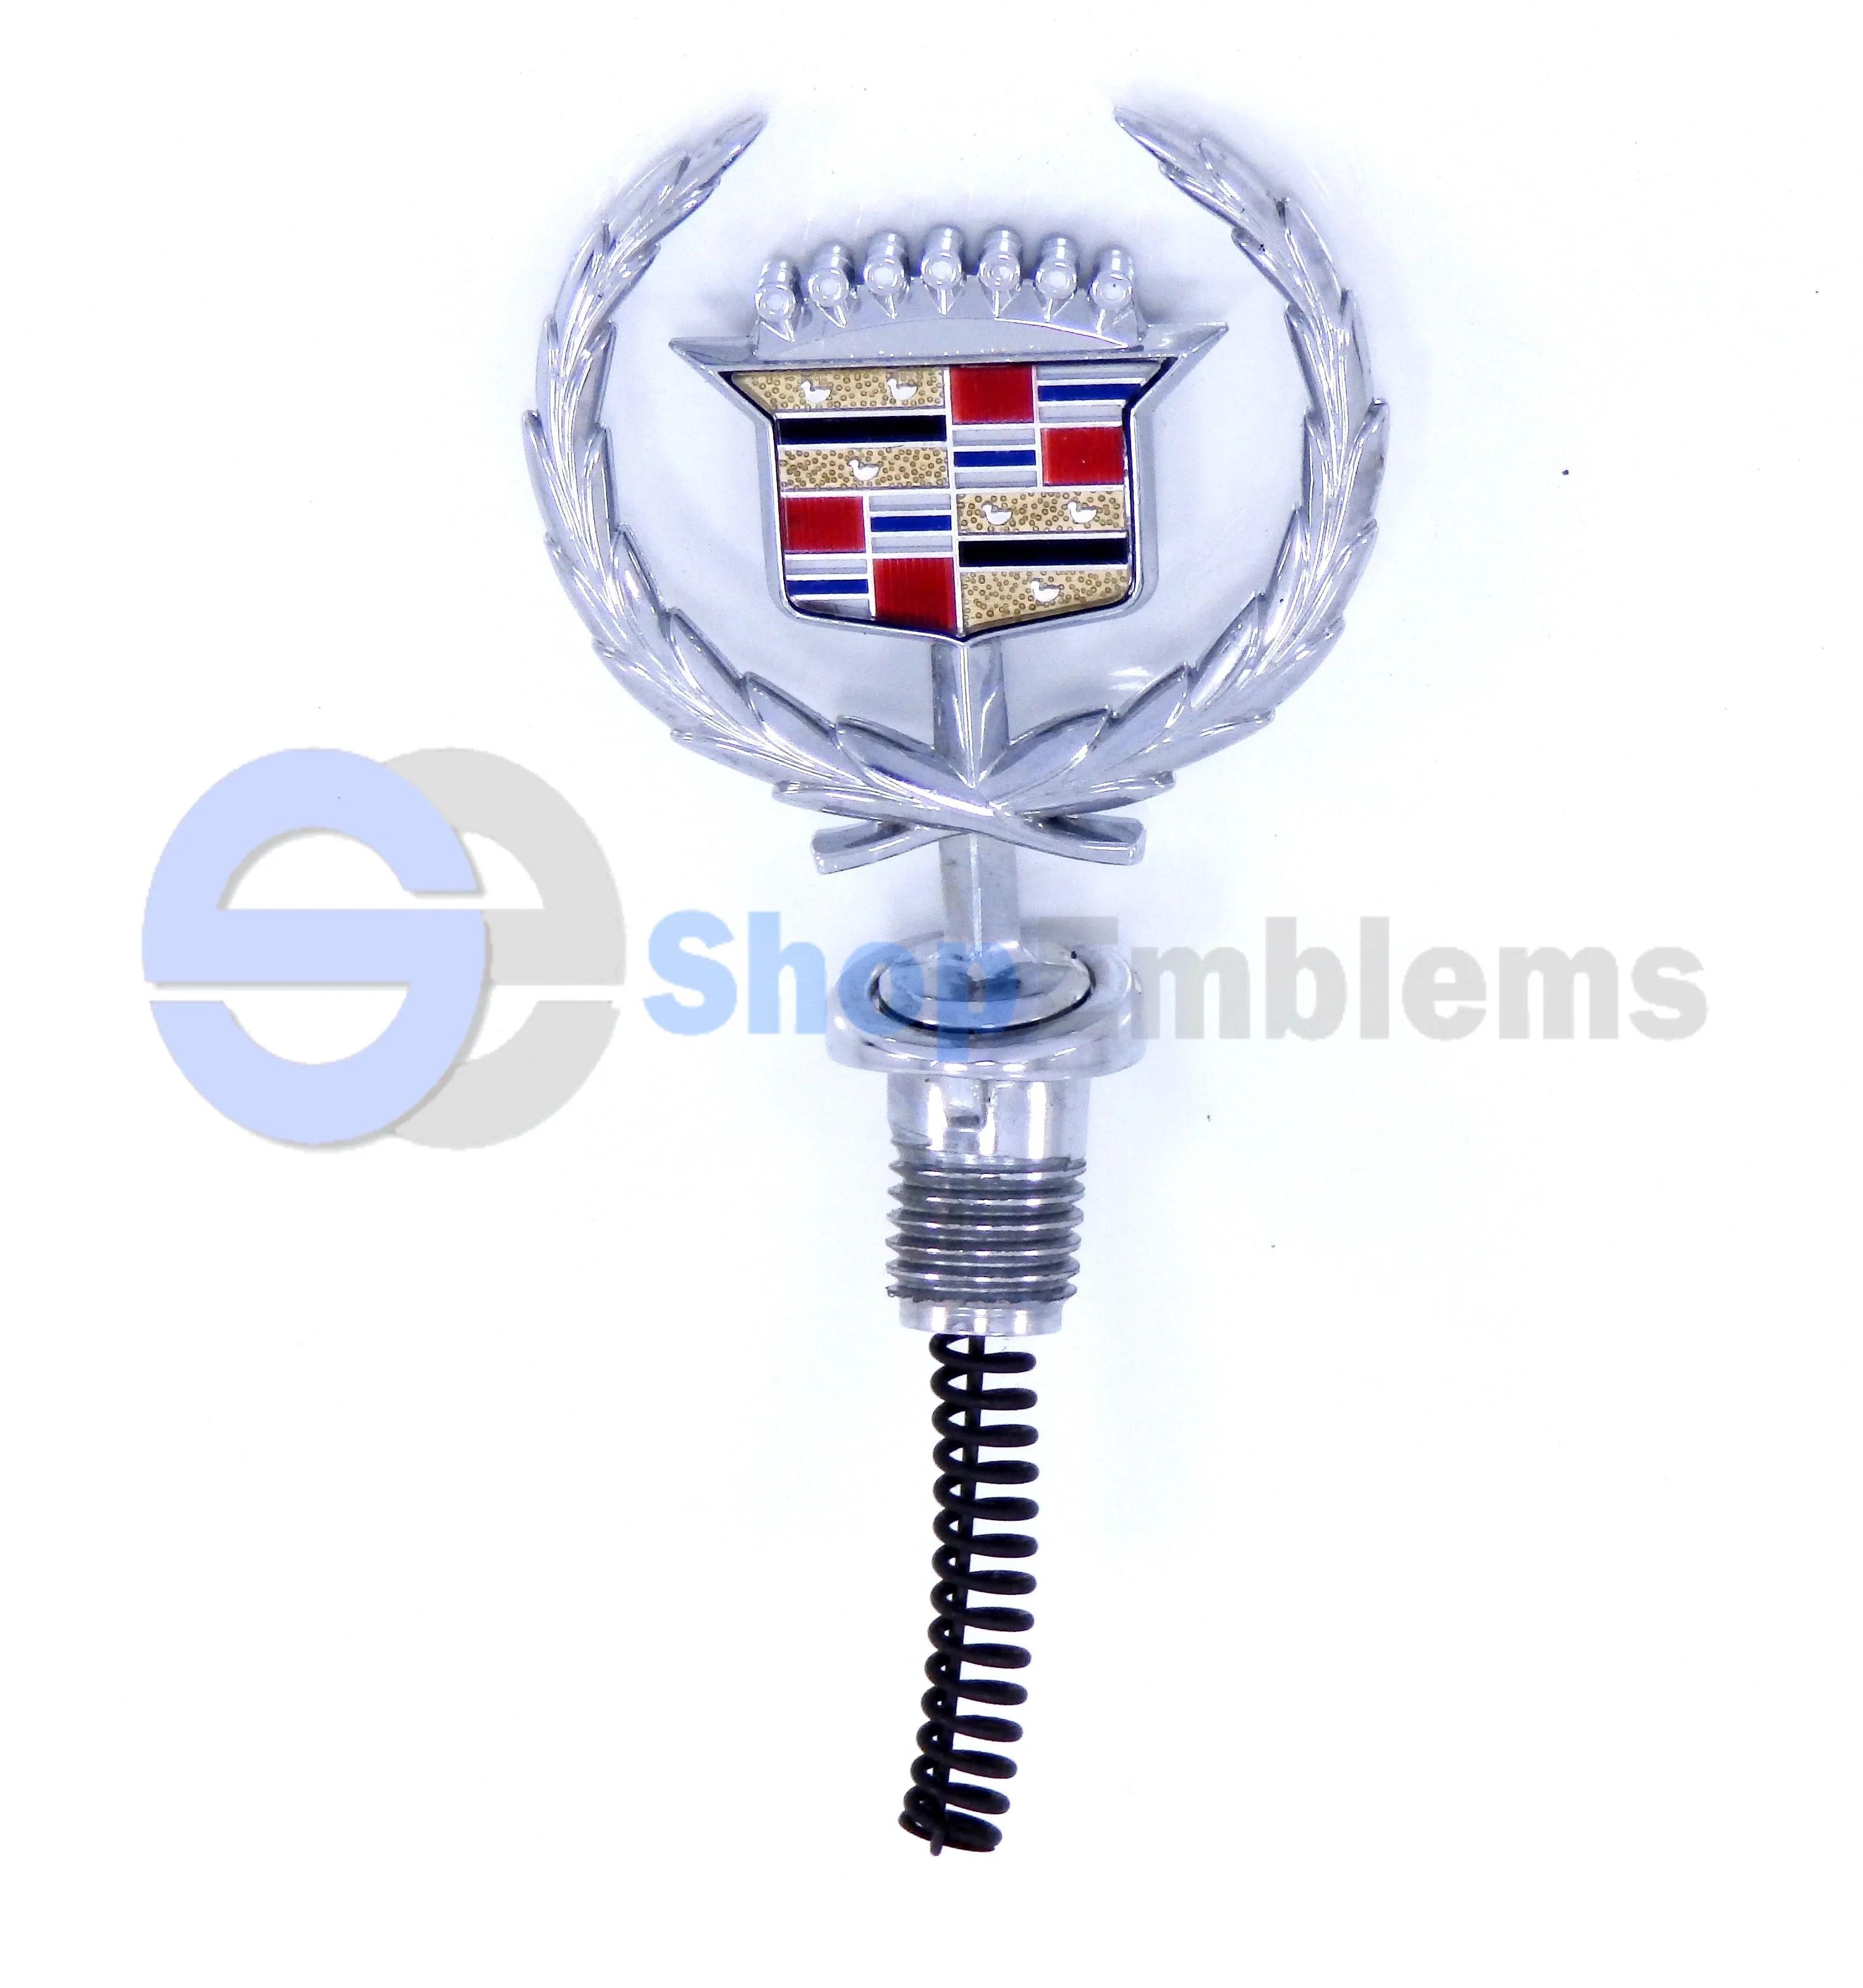 89 90 91 92 93 cadillac fleetwood deville hood ornament logo emblem badge oem nameplate crest [ 3014 x 3216 Pixel ]